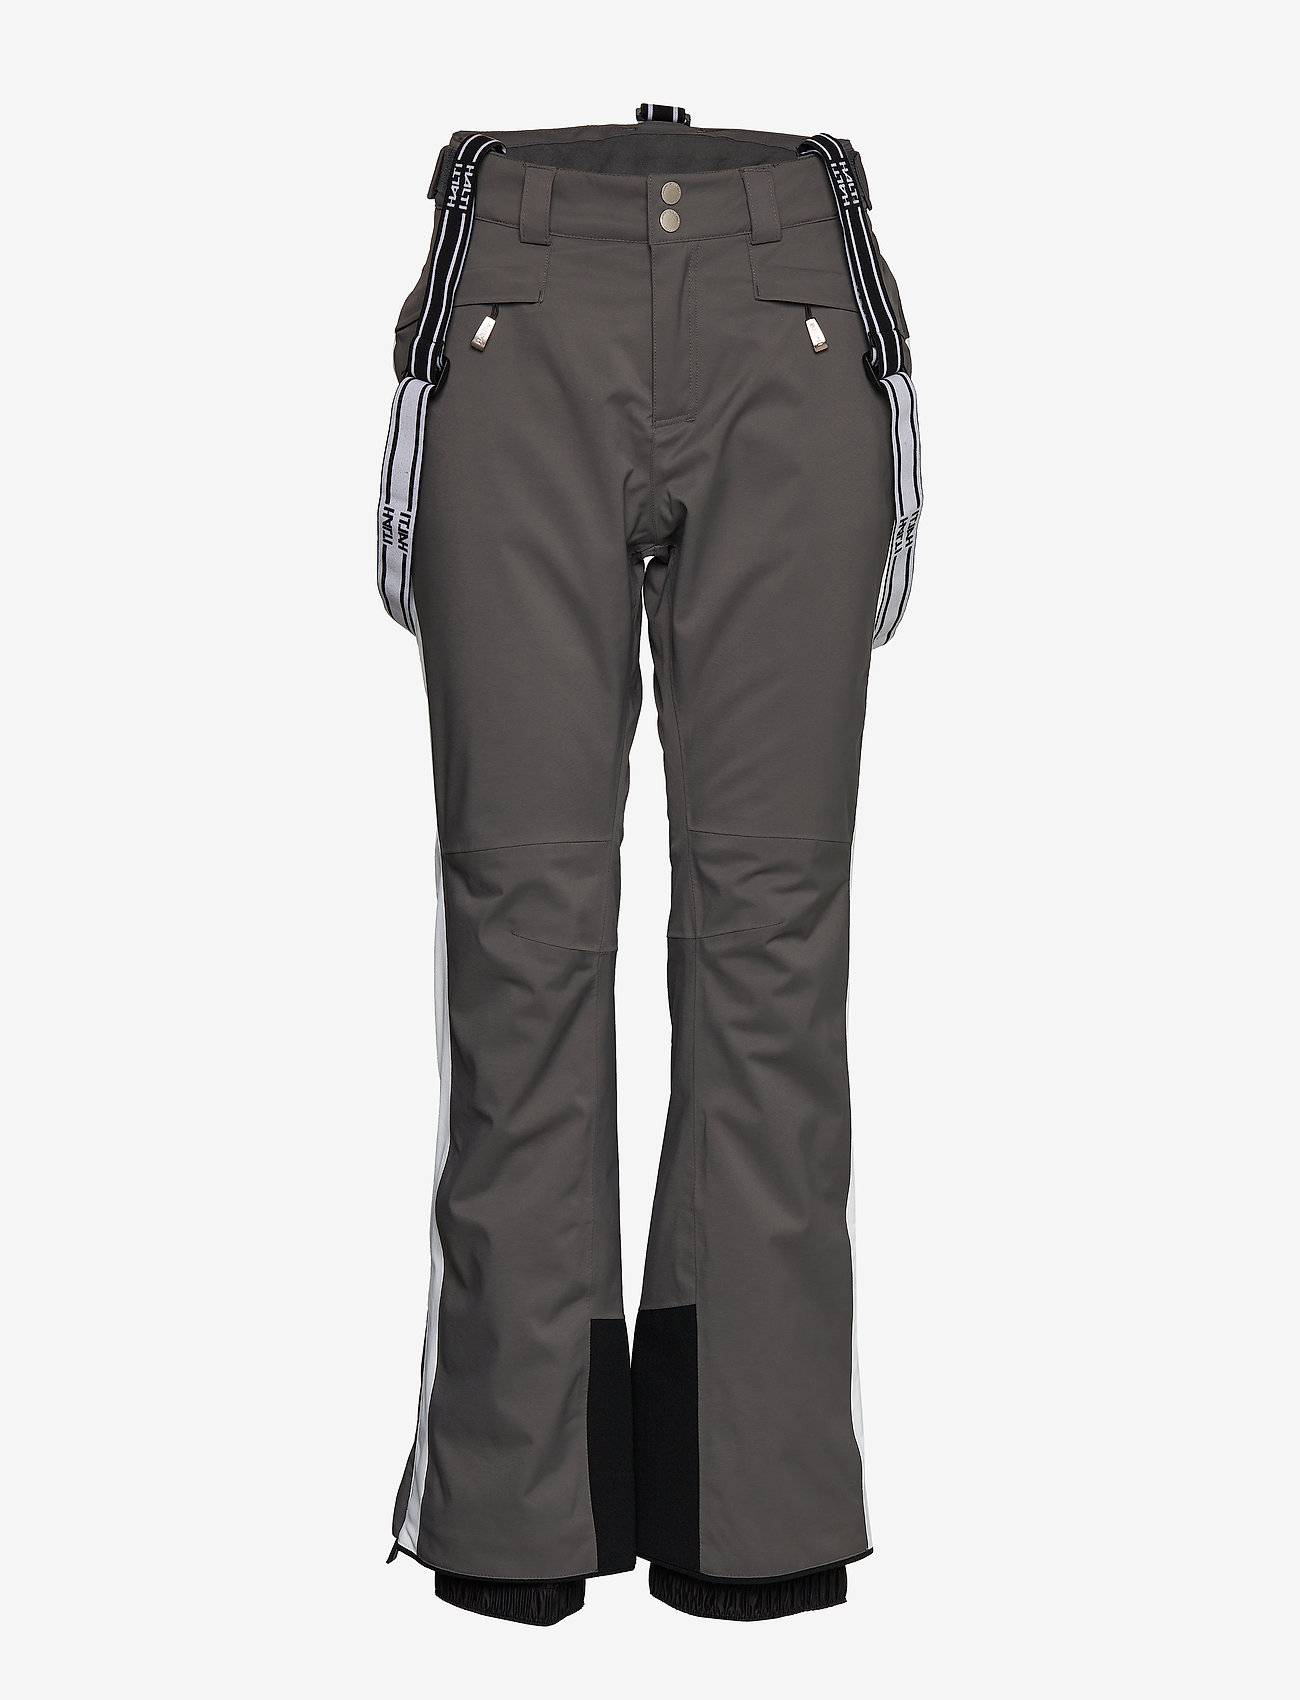 Halti - Podium Women's DX Ski Pants - insulated pants - granite grey - 0